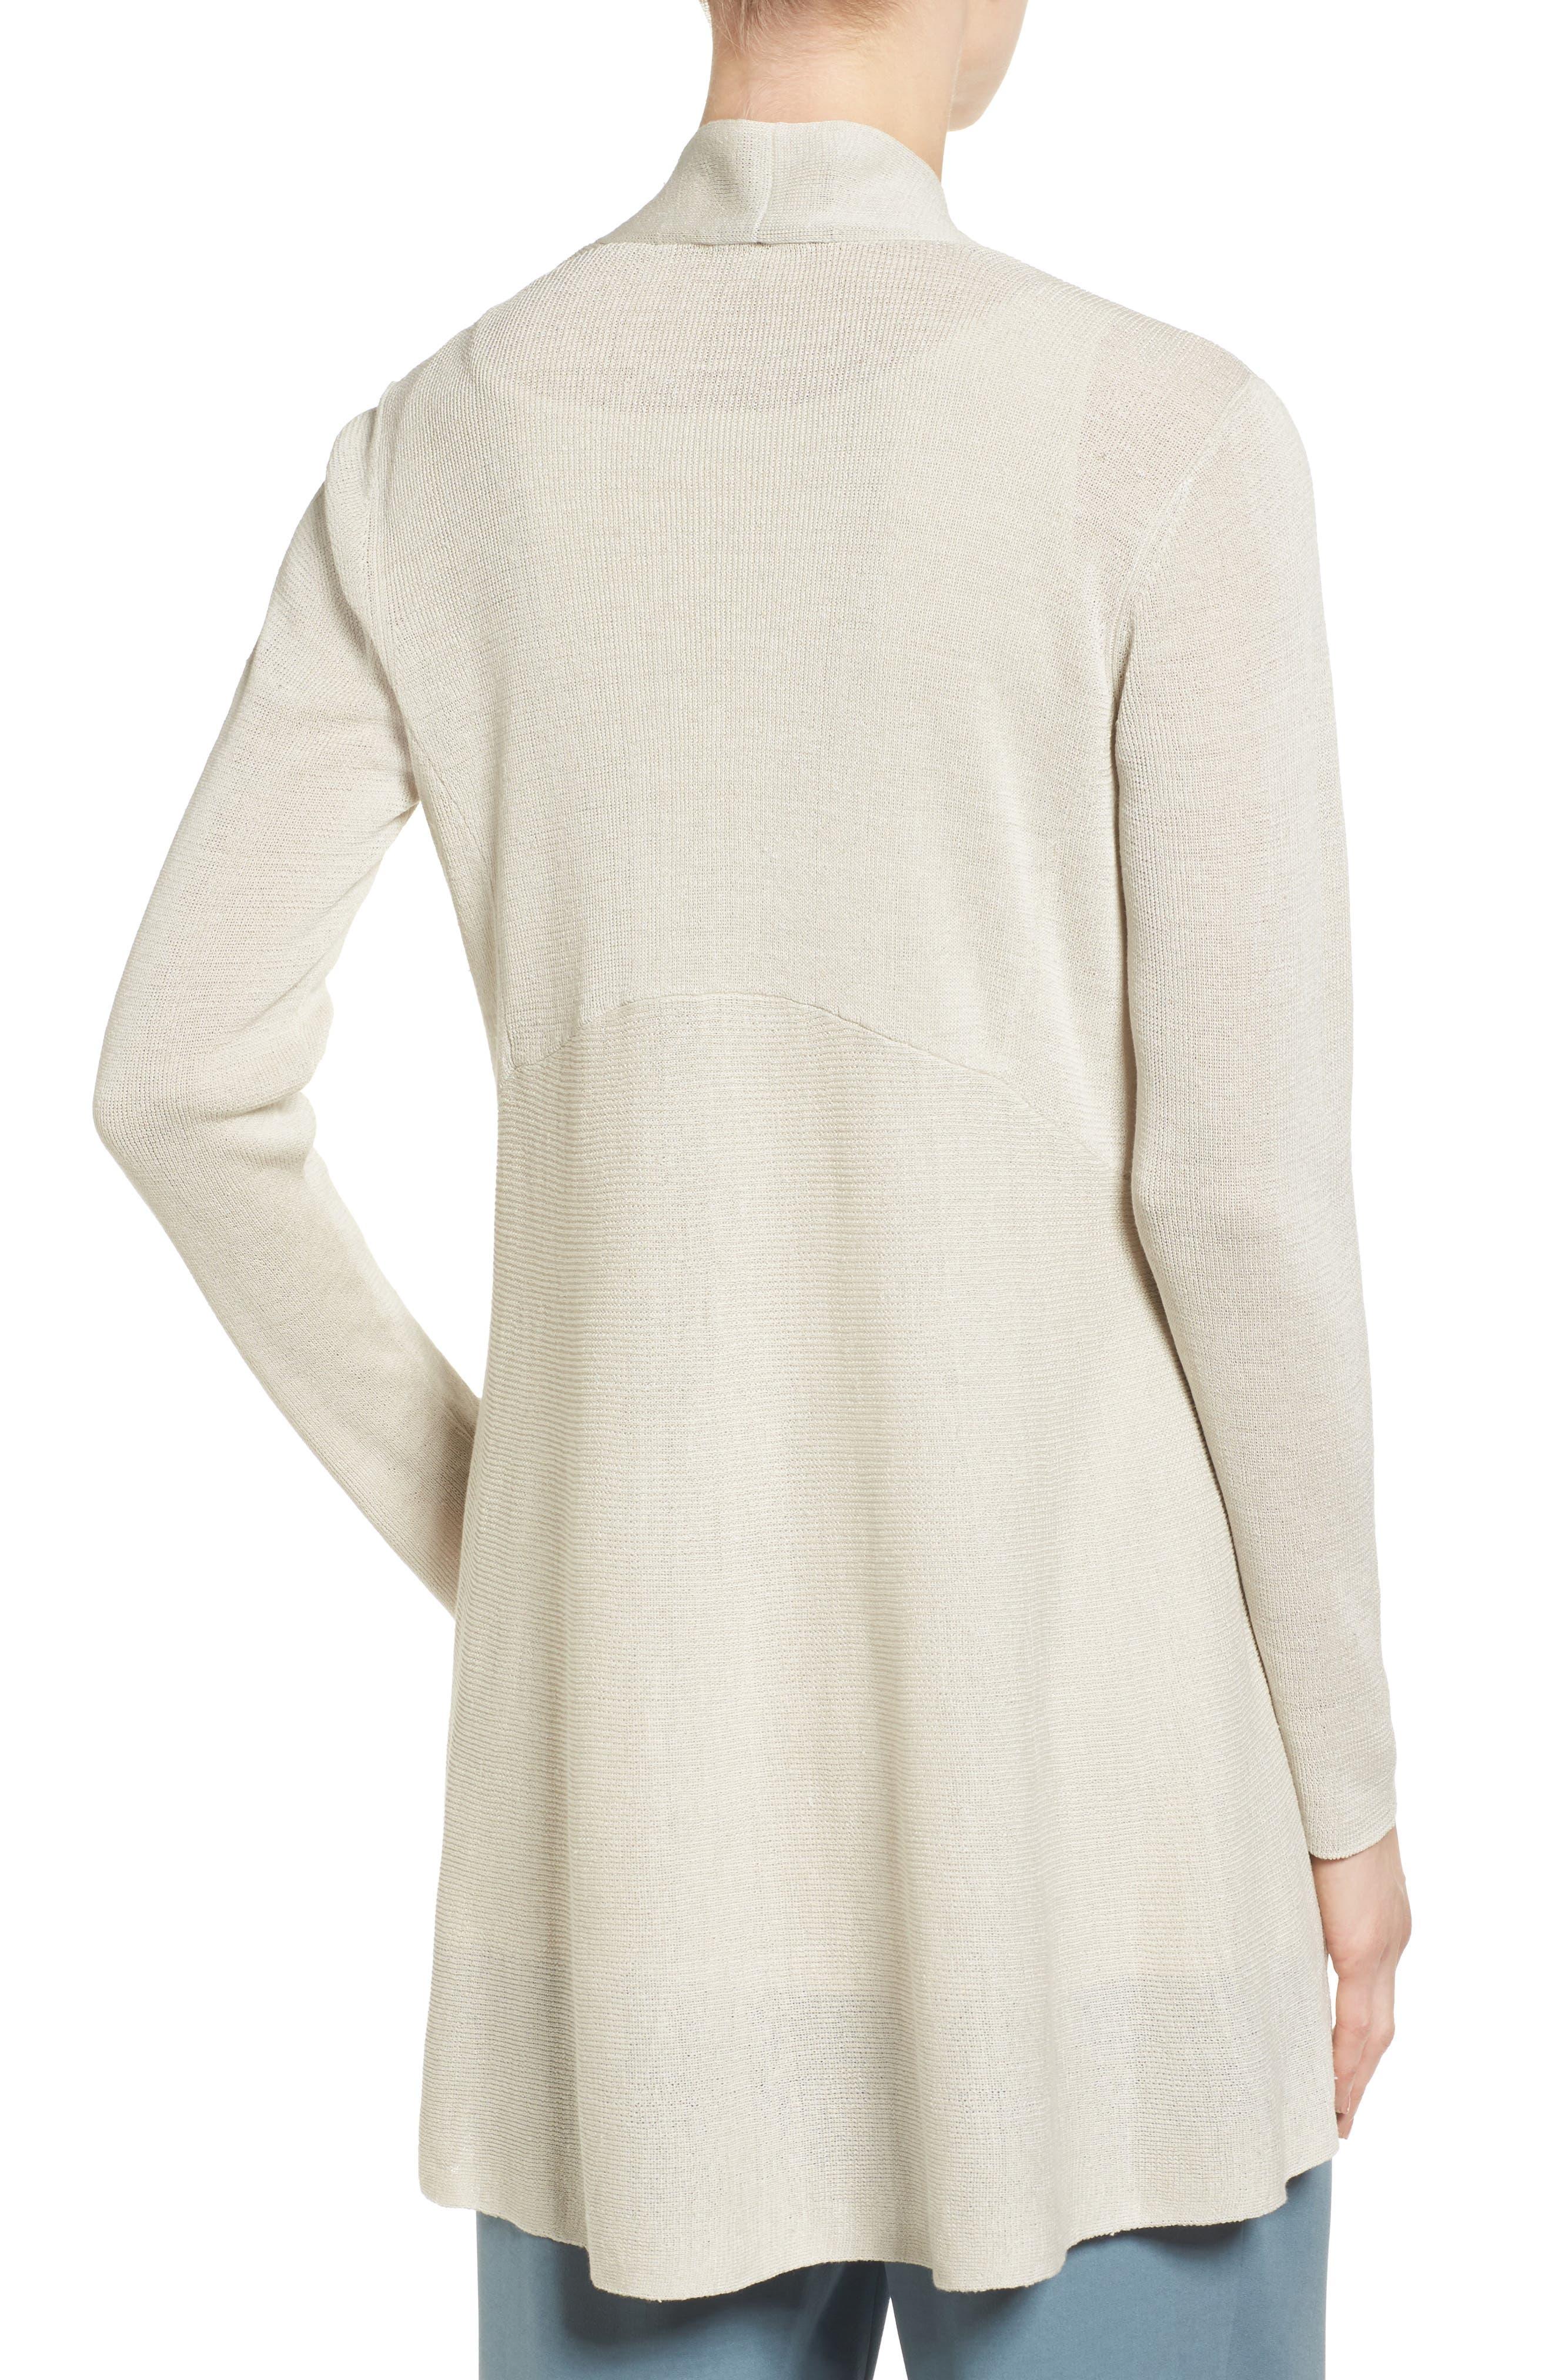 Alternate Image 2  - Eileen Fisher Shaped Organic Linen Blend Cardigan (Regular & Petite)